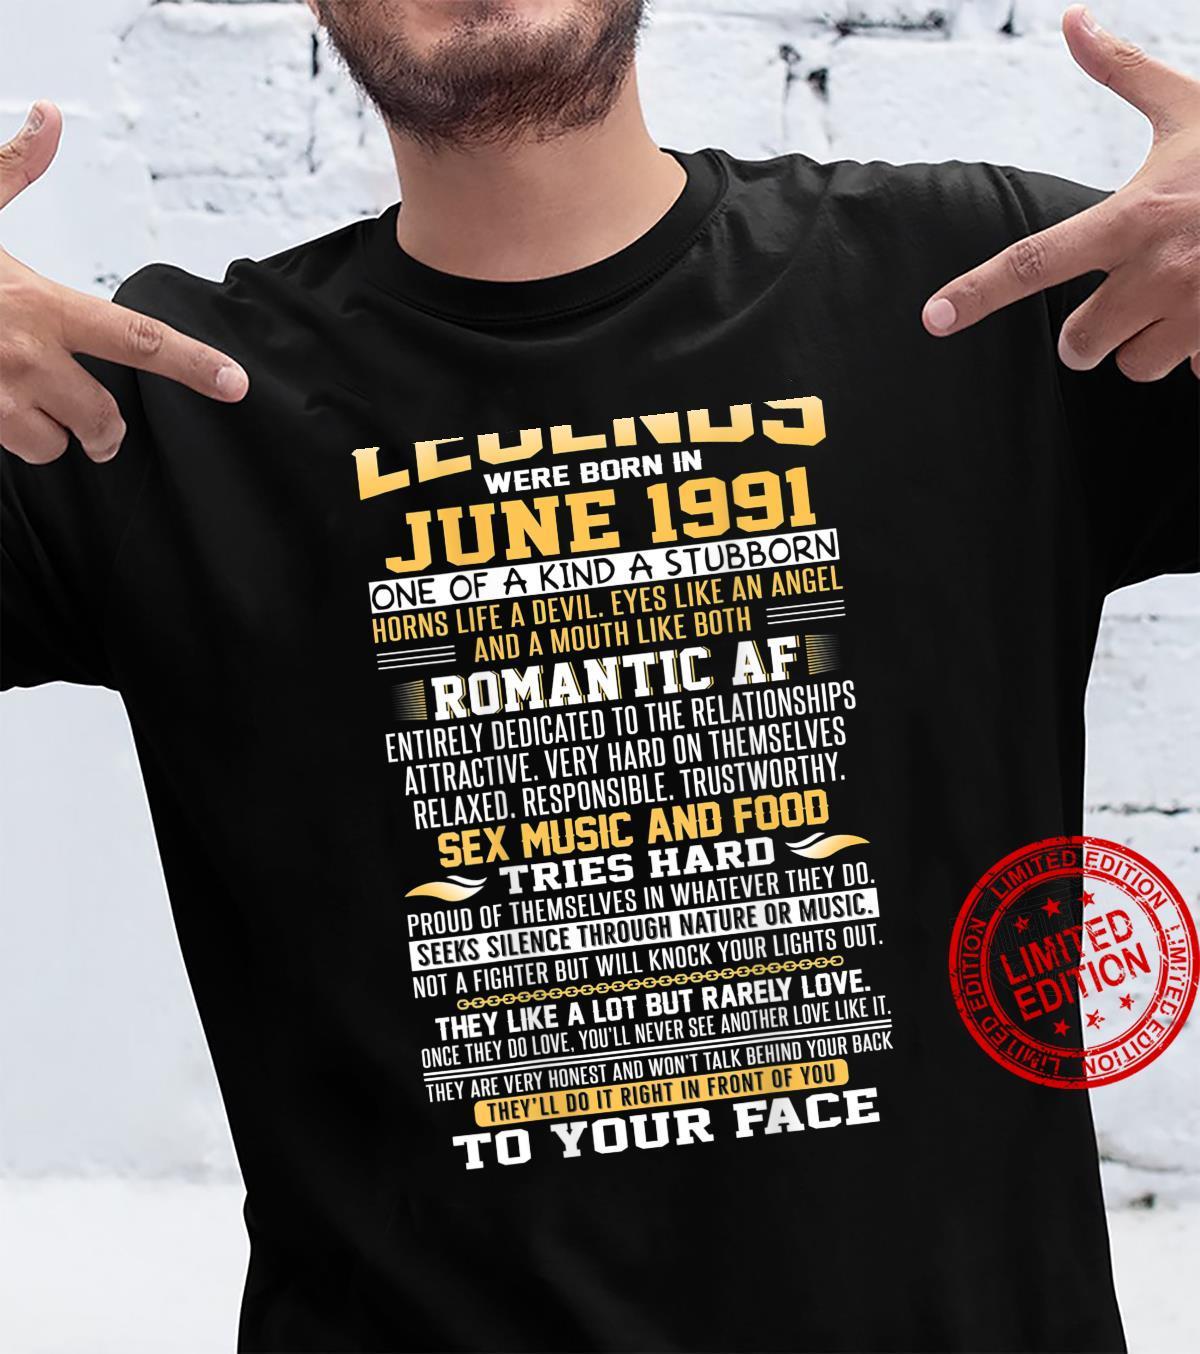 30th birthday shirt Legends were born in June 1991 Shirt